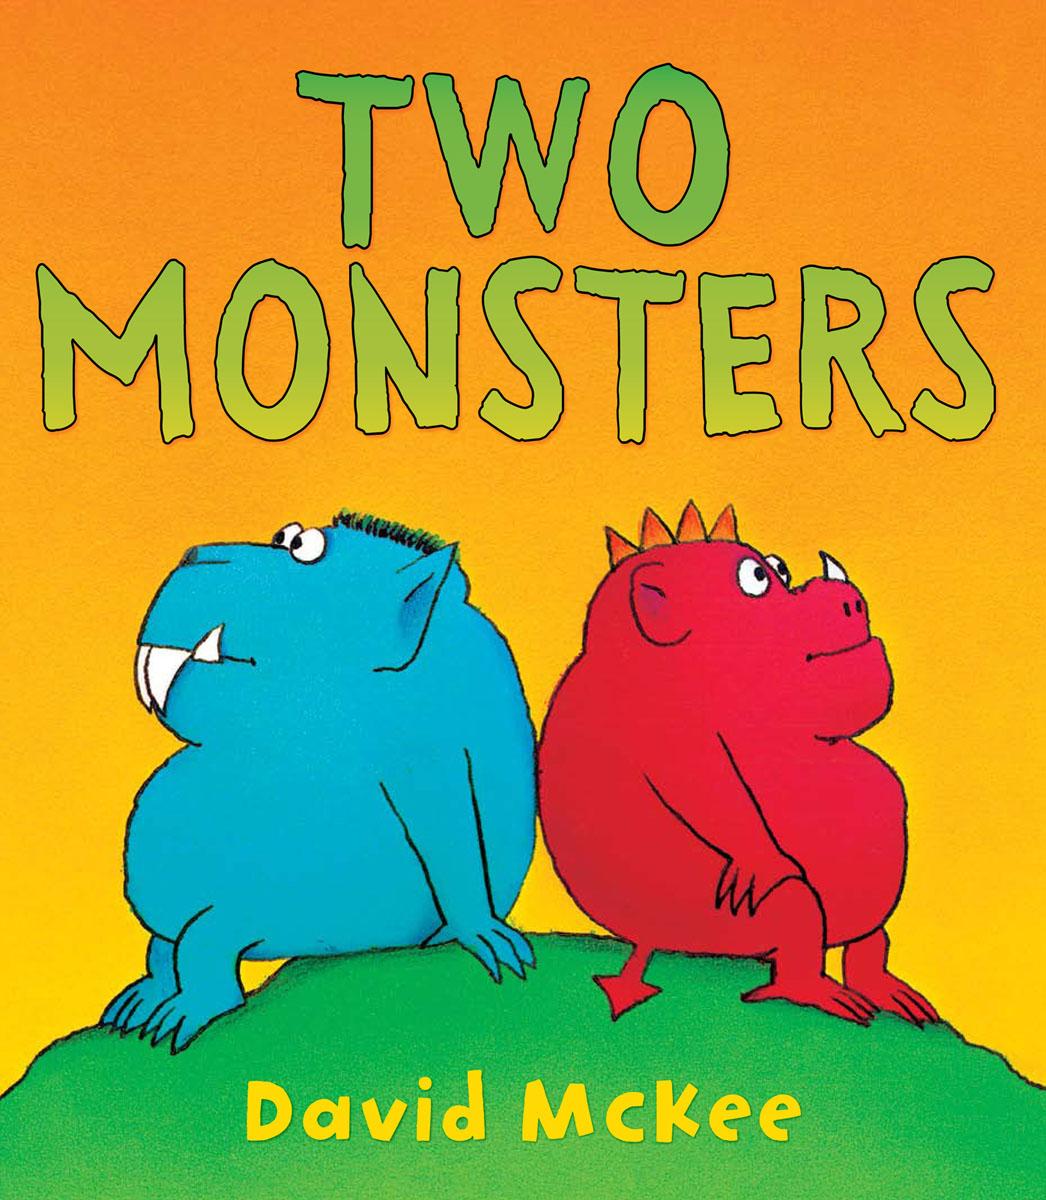 Two Monsters monsters of folk monsters of folk monsters of folk